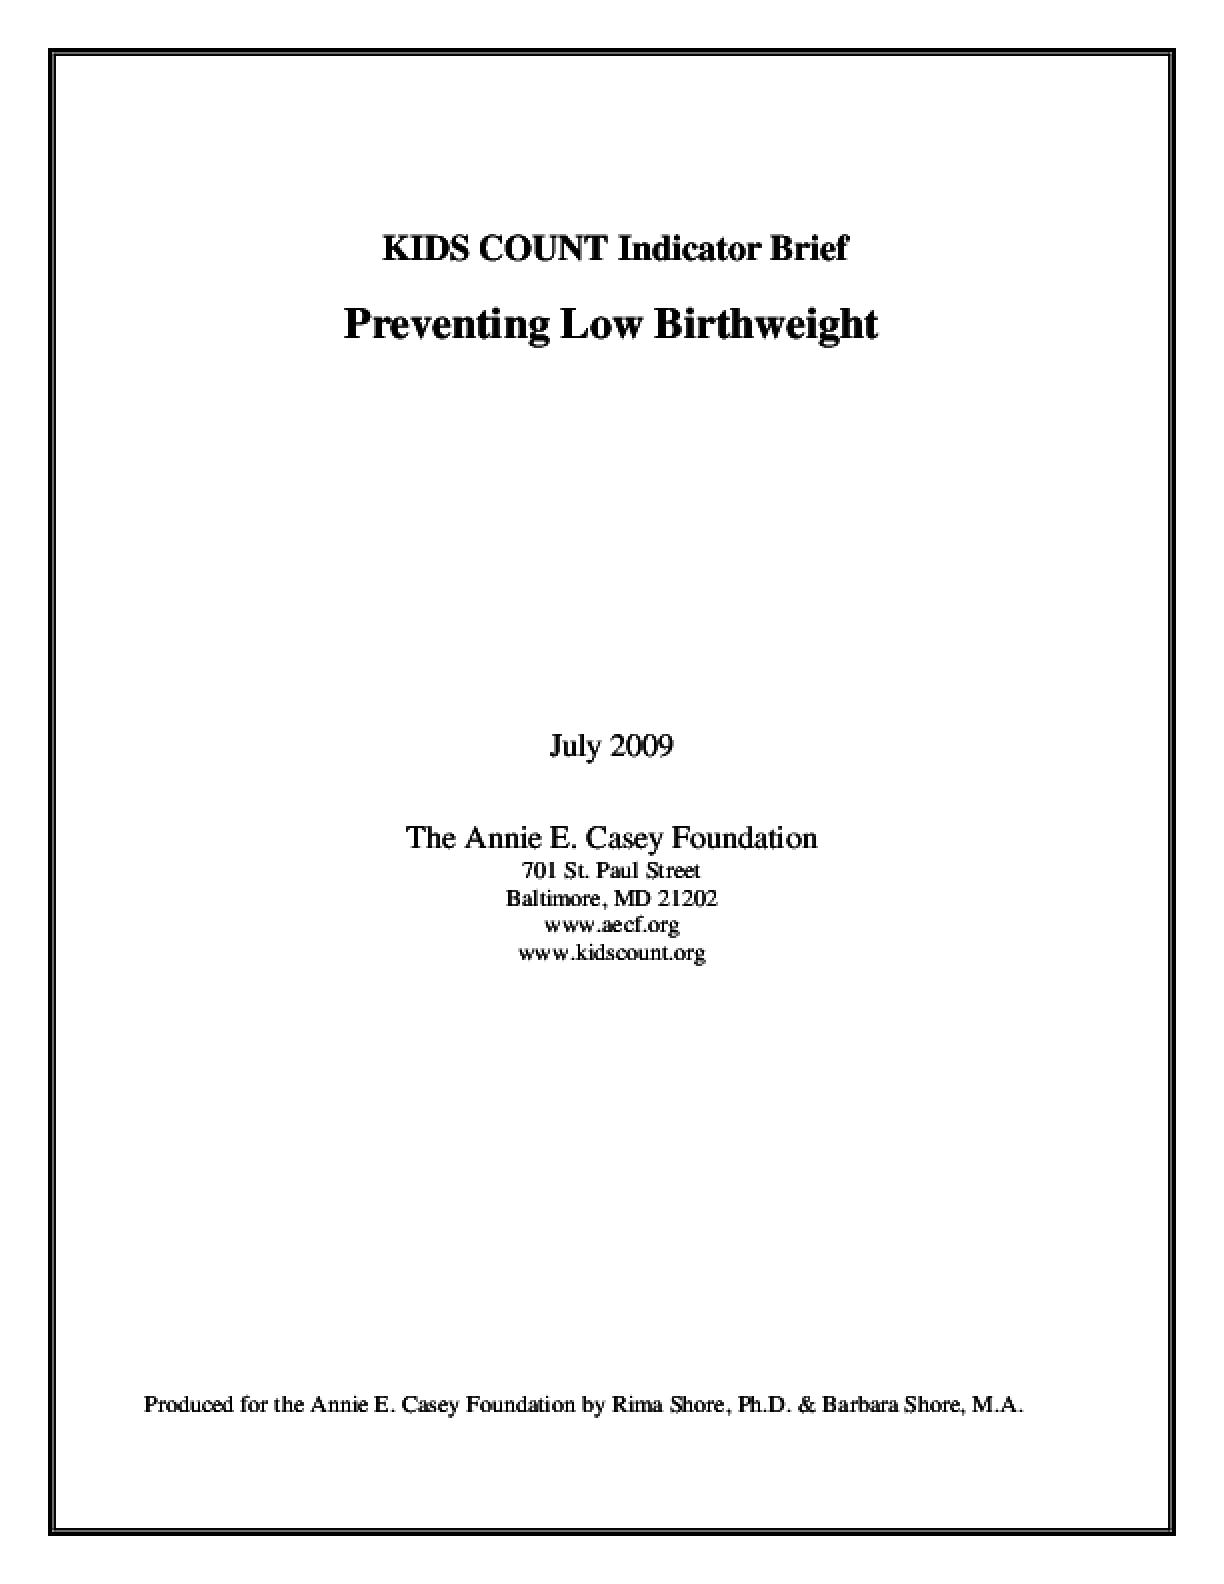 KIDS COUNT Indicator Brief: Preventing Low Birthweight